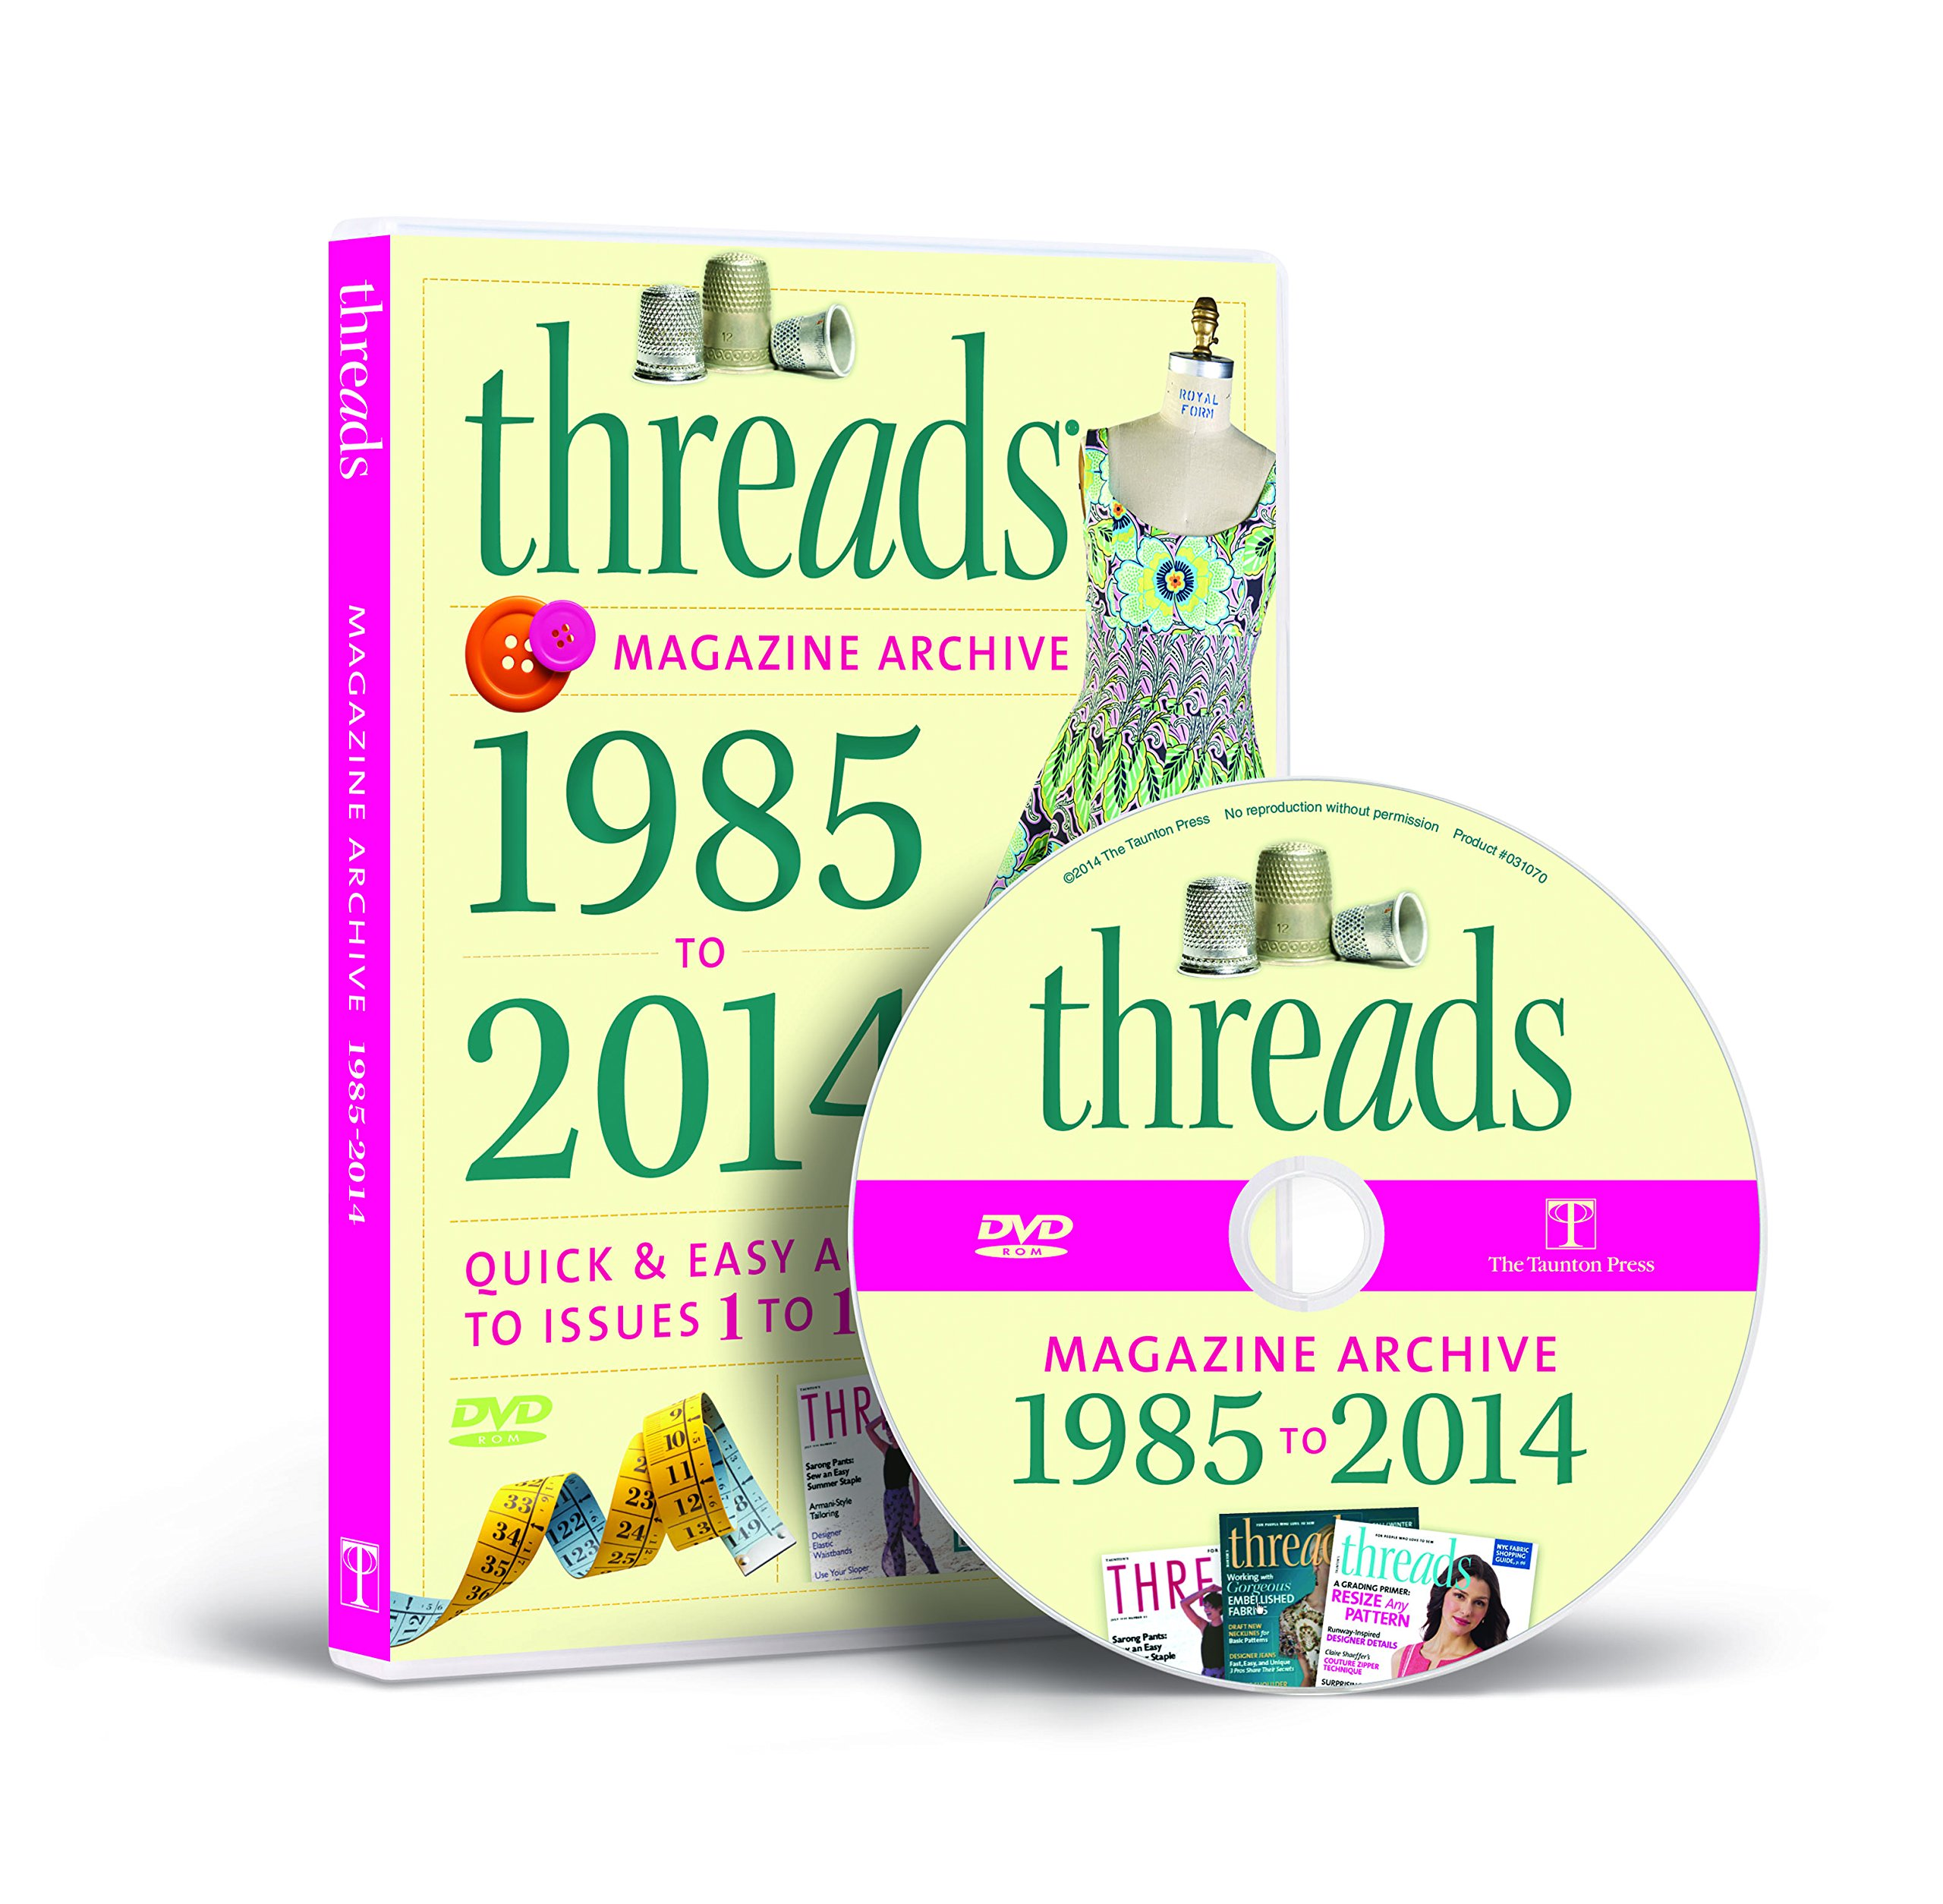 Thread's 2014 Magazine Archive